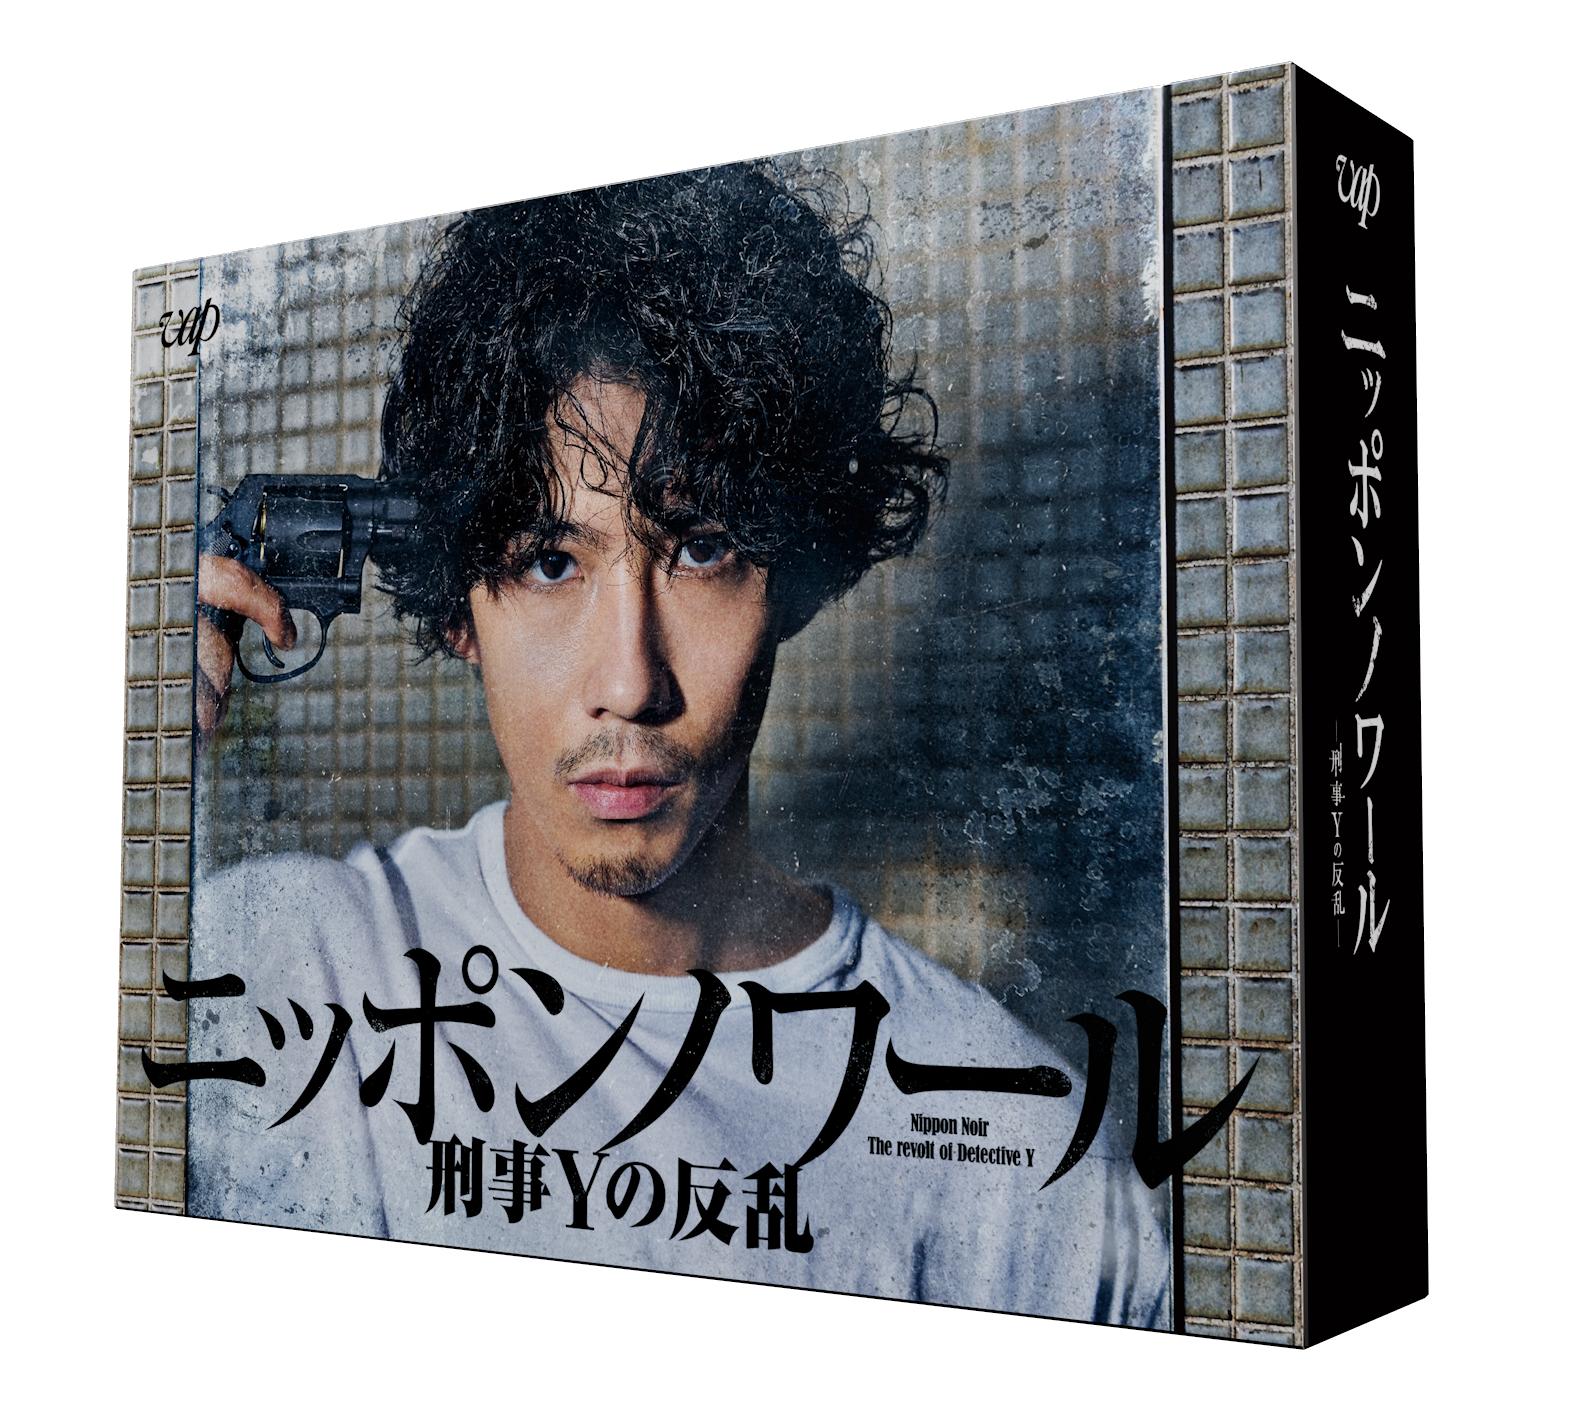 NTVドラマ「ニッポンノワール」